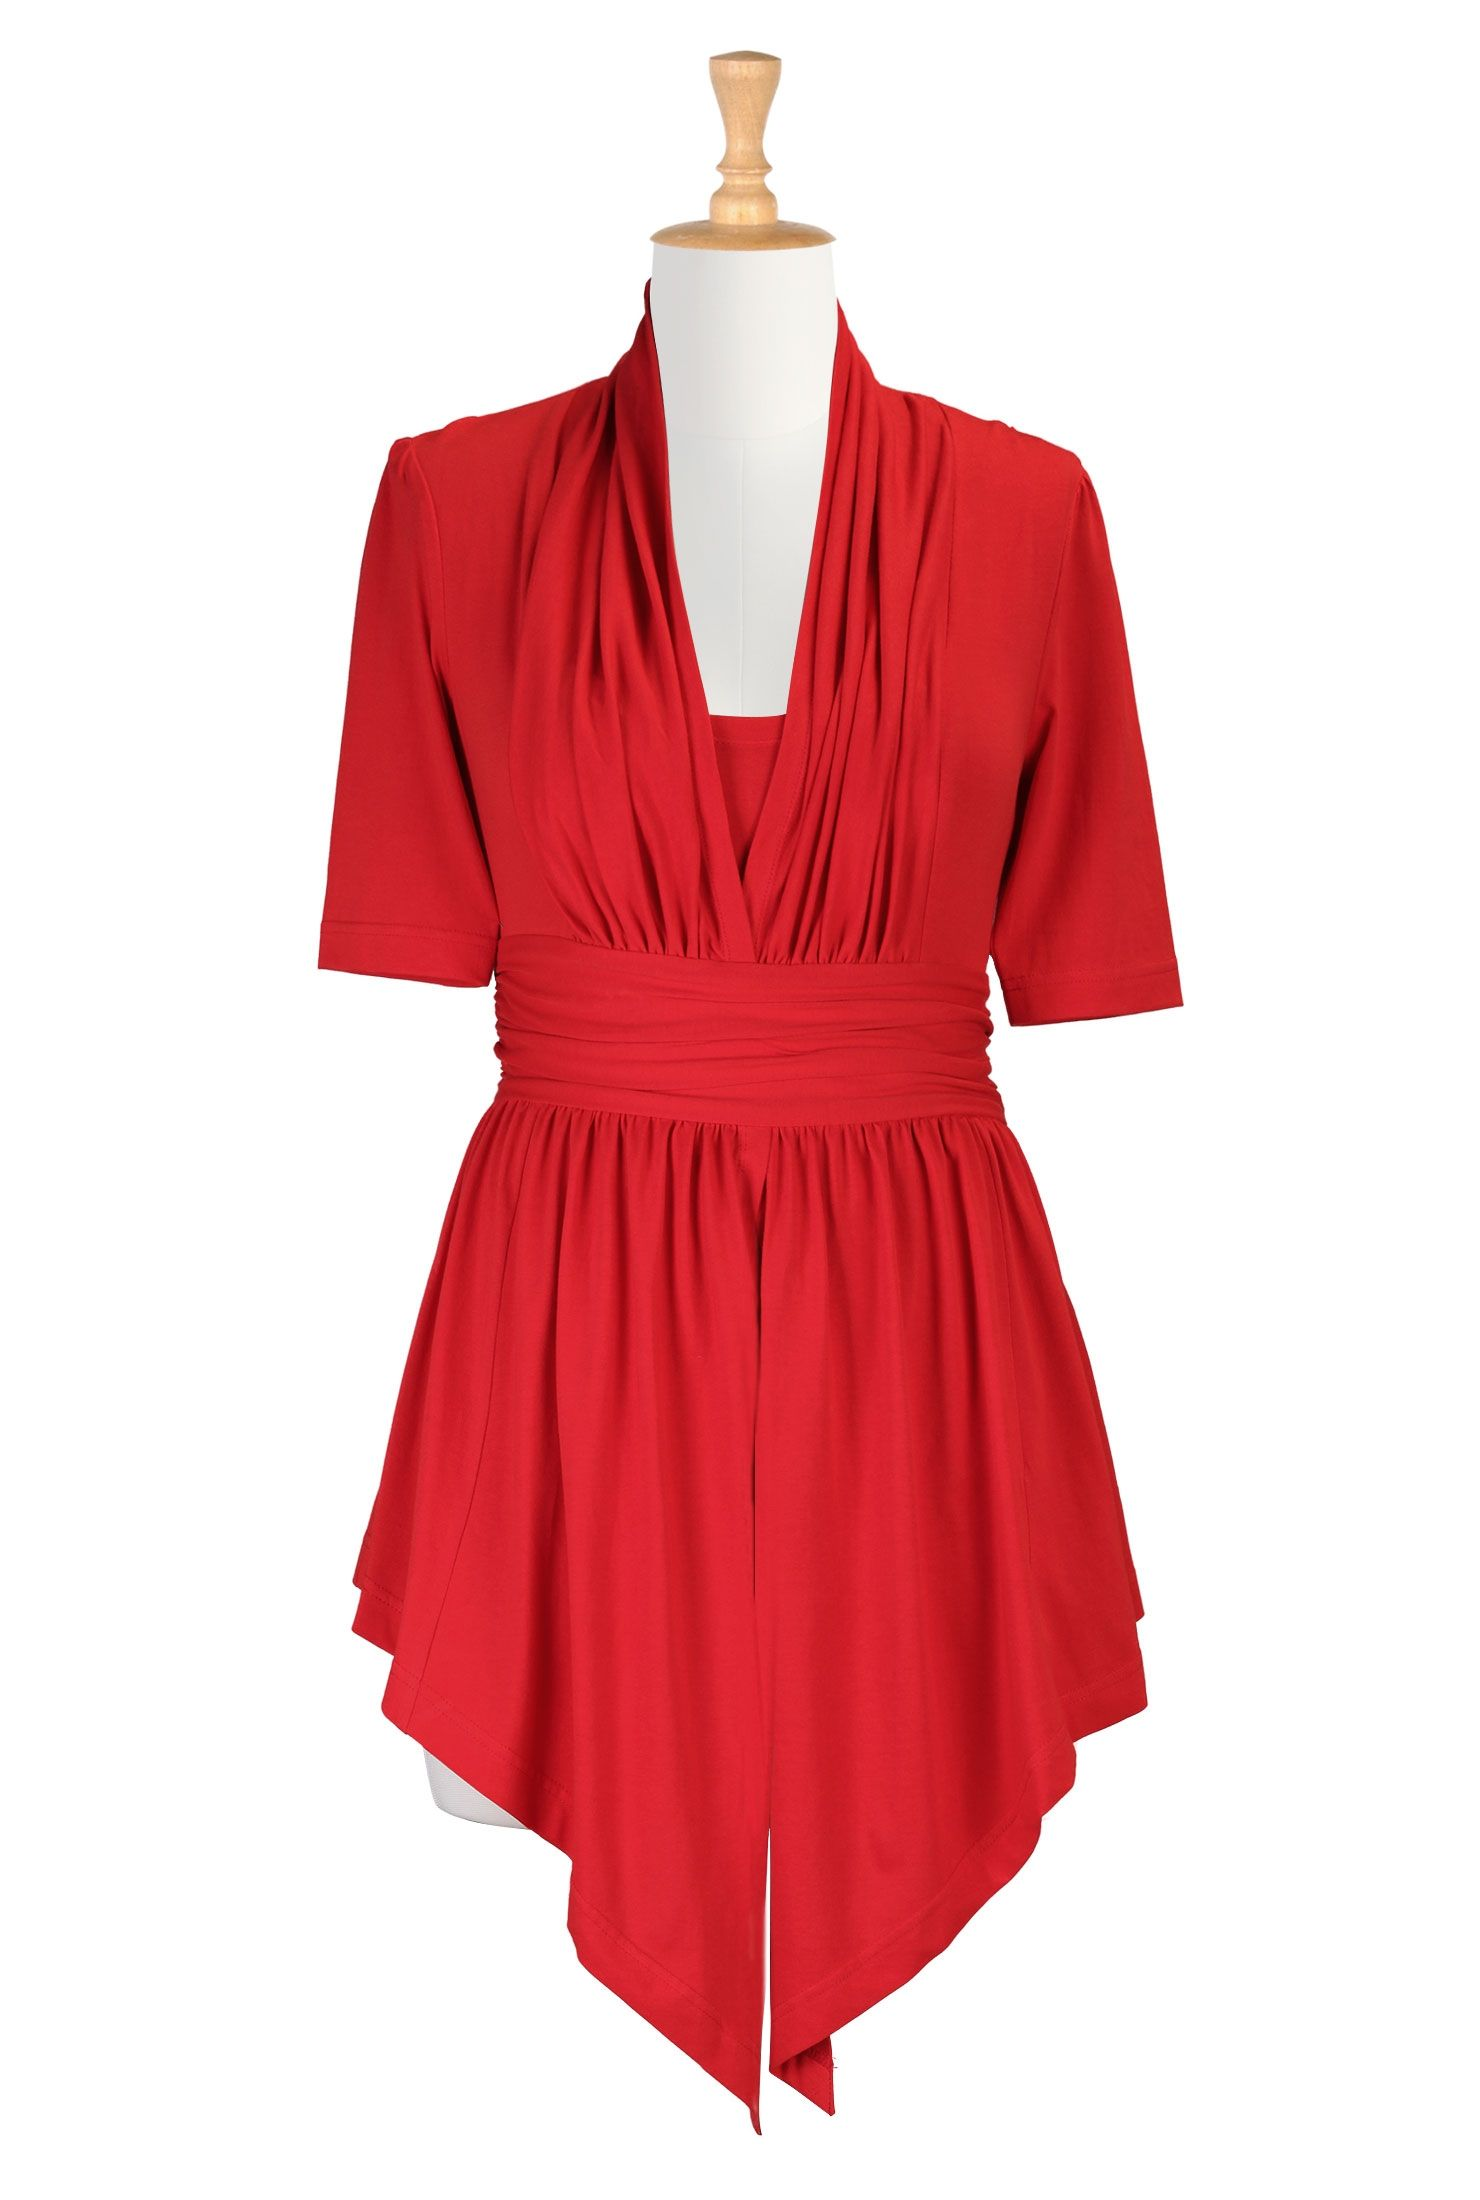 1e7df55ce649eb Women's designer clothing - Shop Women's Long Sleeve Tops - Tunic Tops,  Ladies Tops, Fashion Tops, Plus Size Tops - | eShakti.com